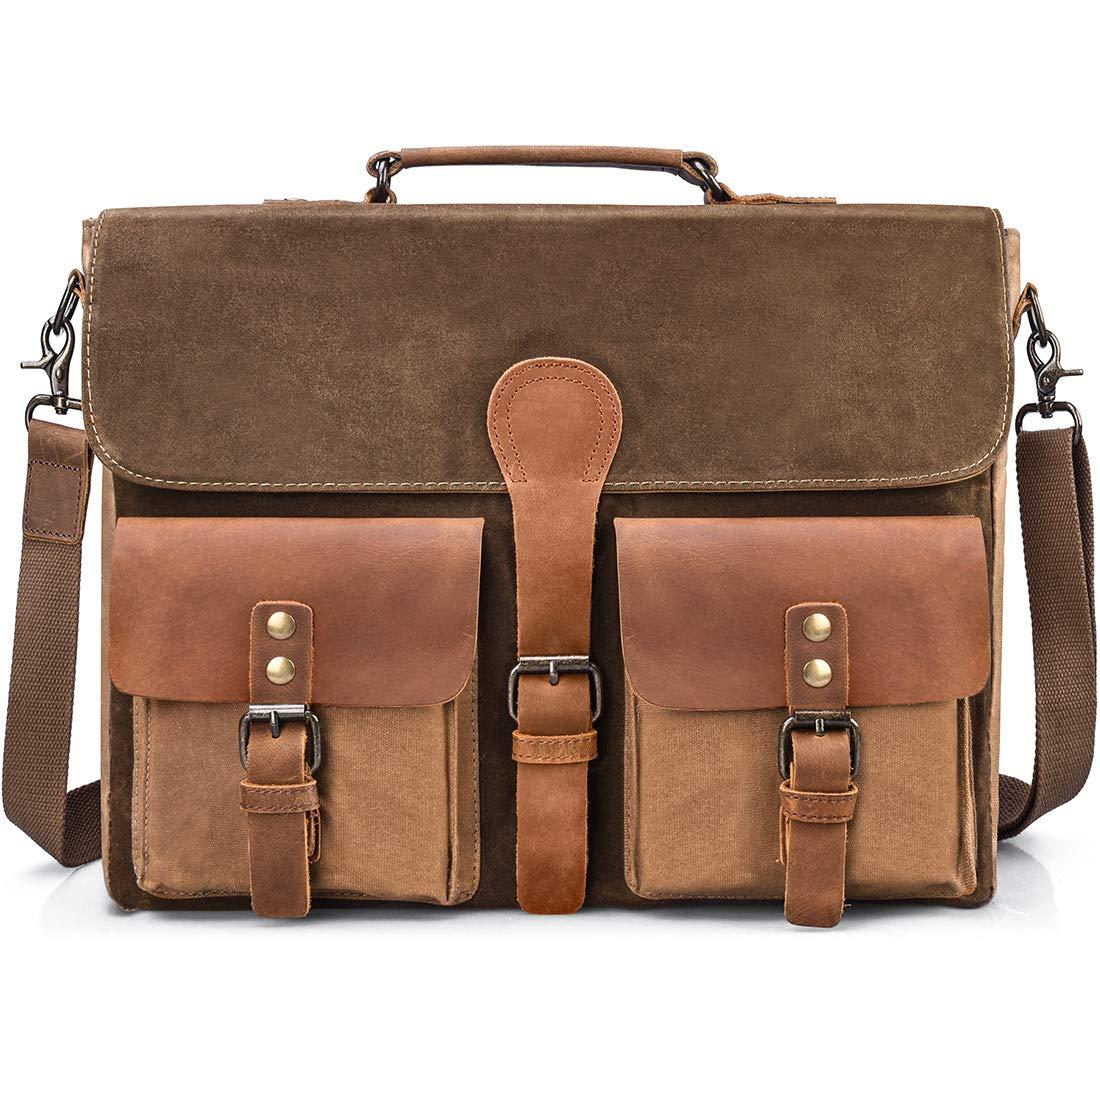 Mens Messenger Bag Vintage Genuine Leather Large Laptop Briefcase 15.6 Inch Waterproof Waxed Canvas Satchel Shoulder Bag Rugged Leather Computer Work Bags Brown